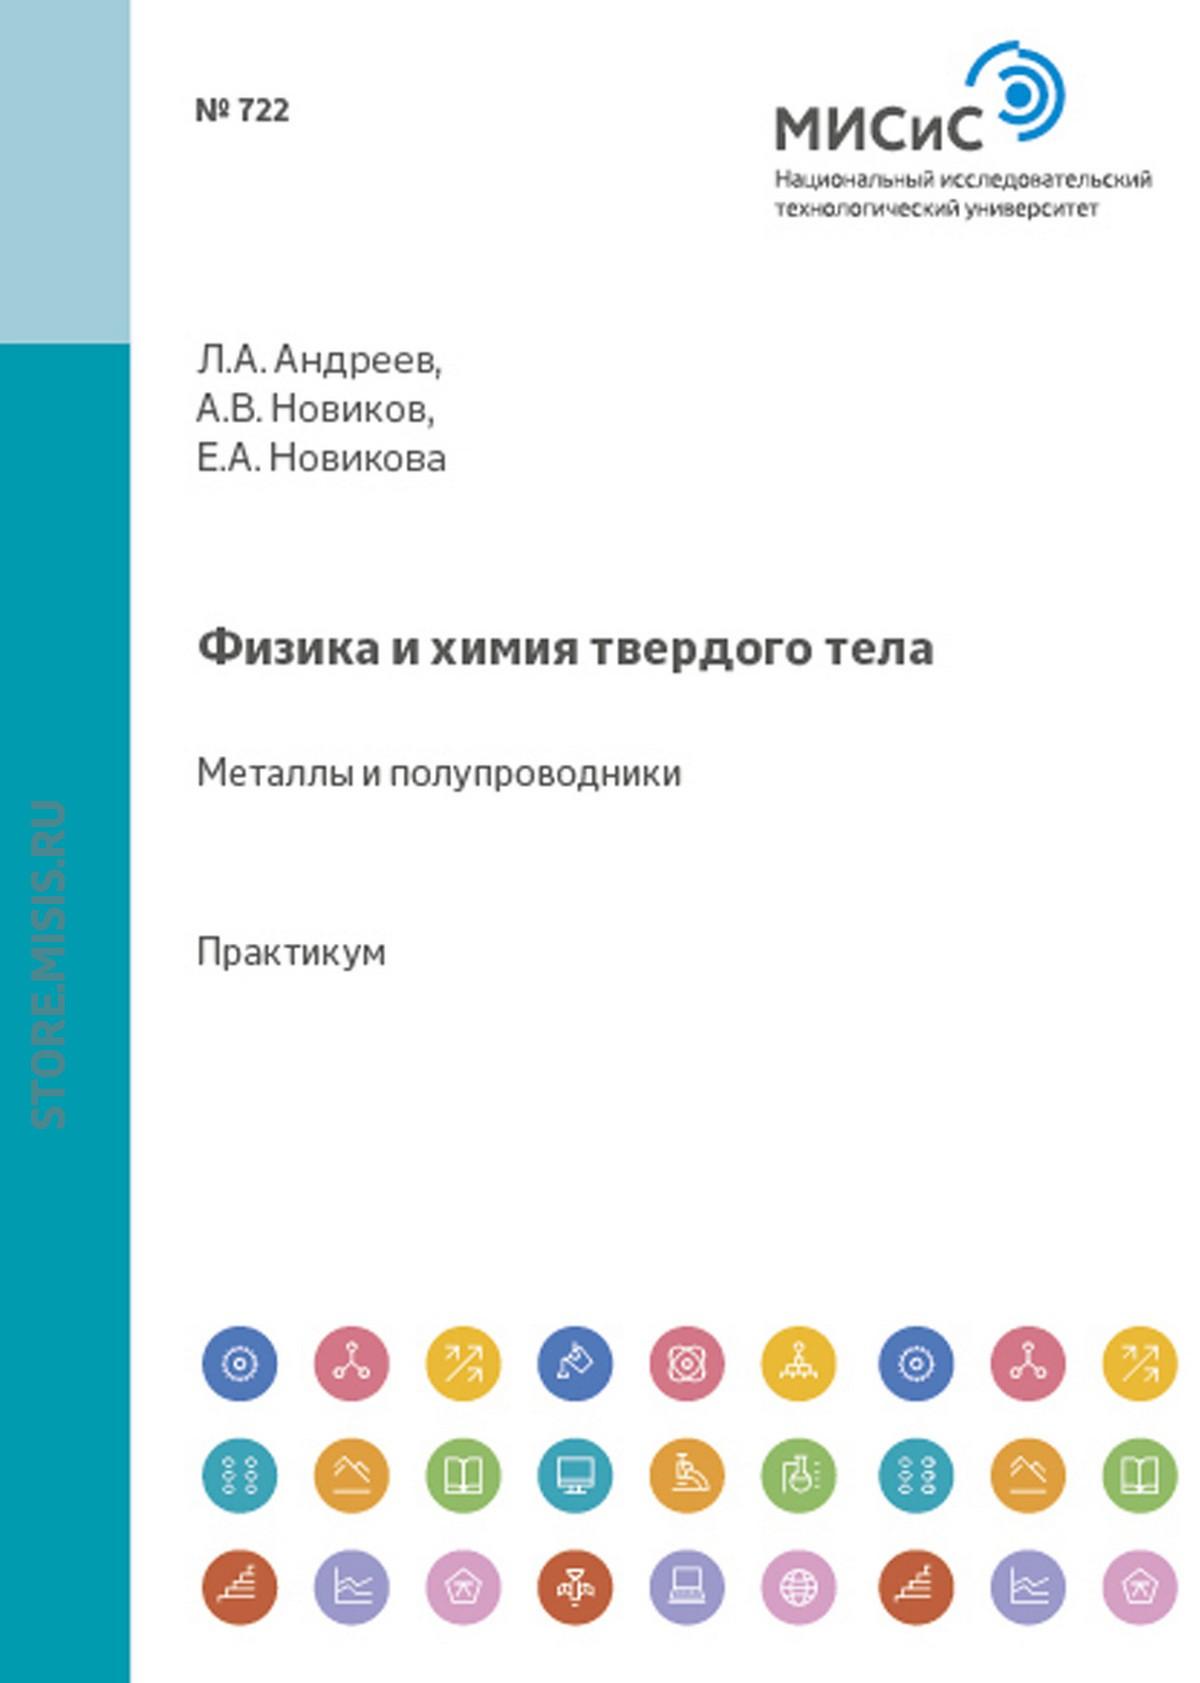 Е. А. Новикова Физика и химия твердого тела. Металлы и полупроводники цена